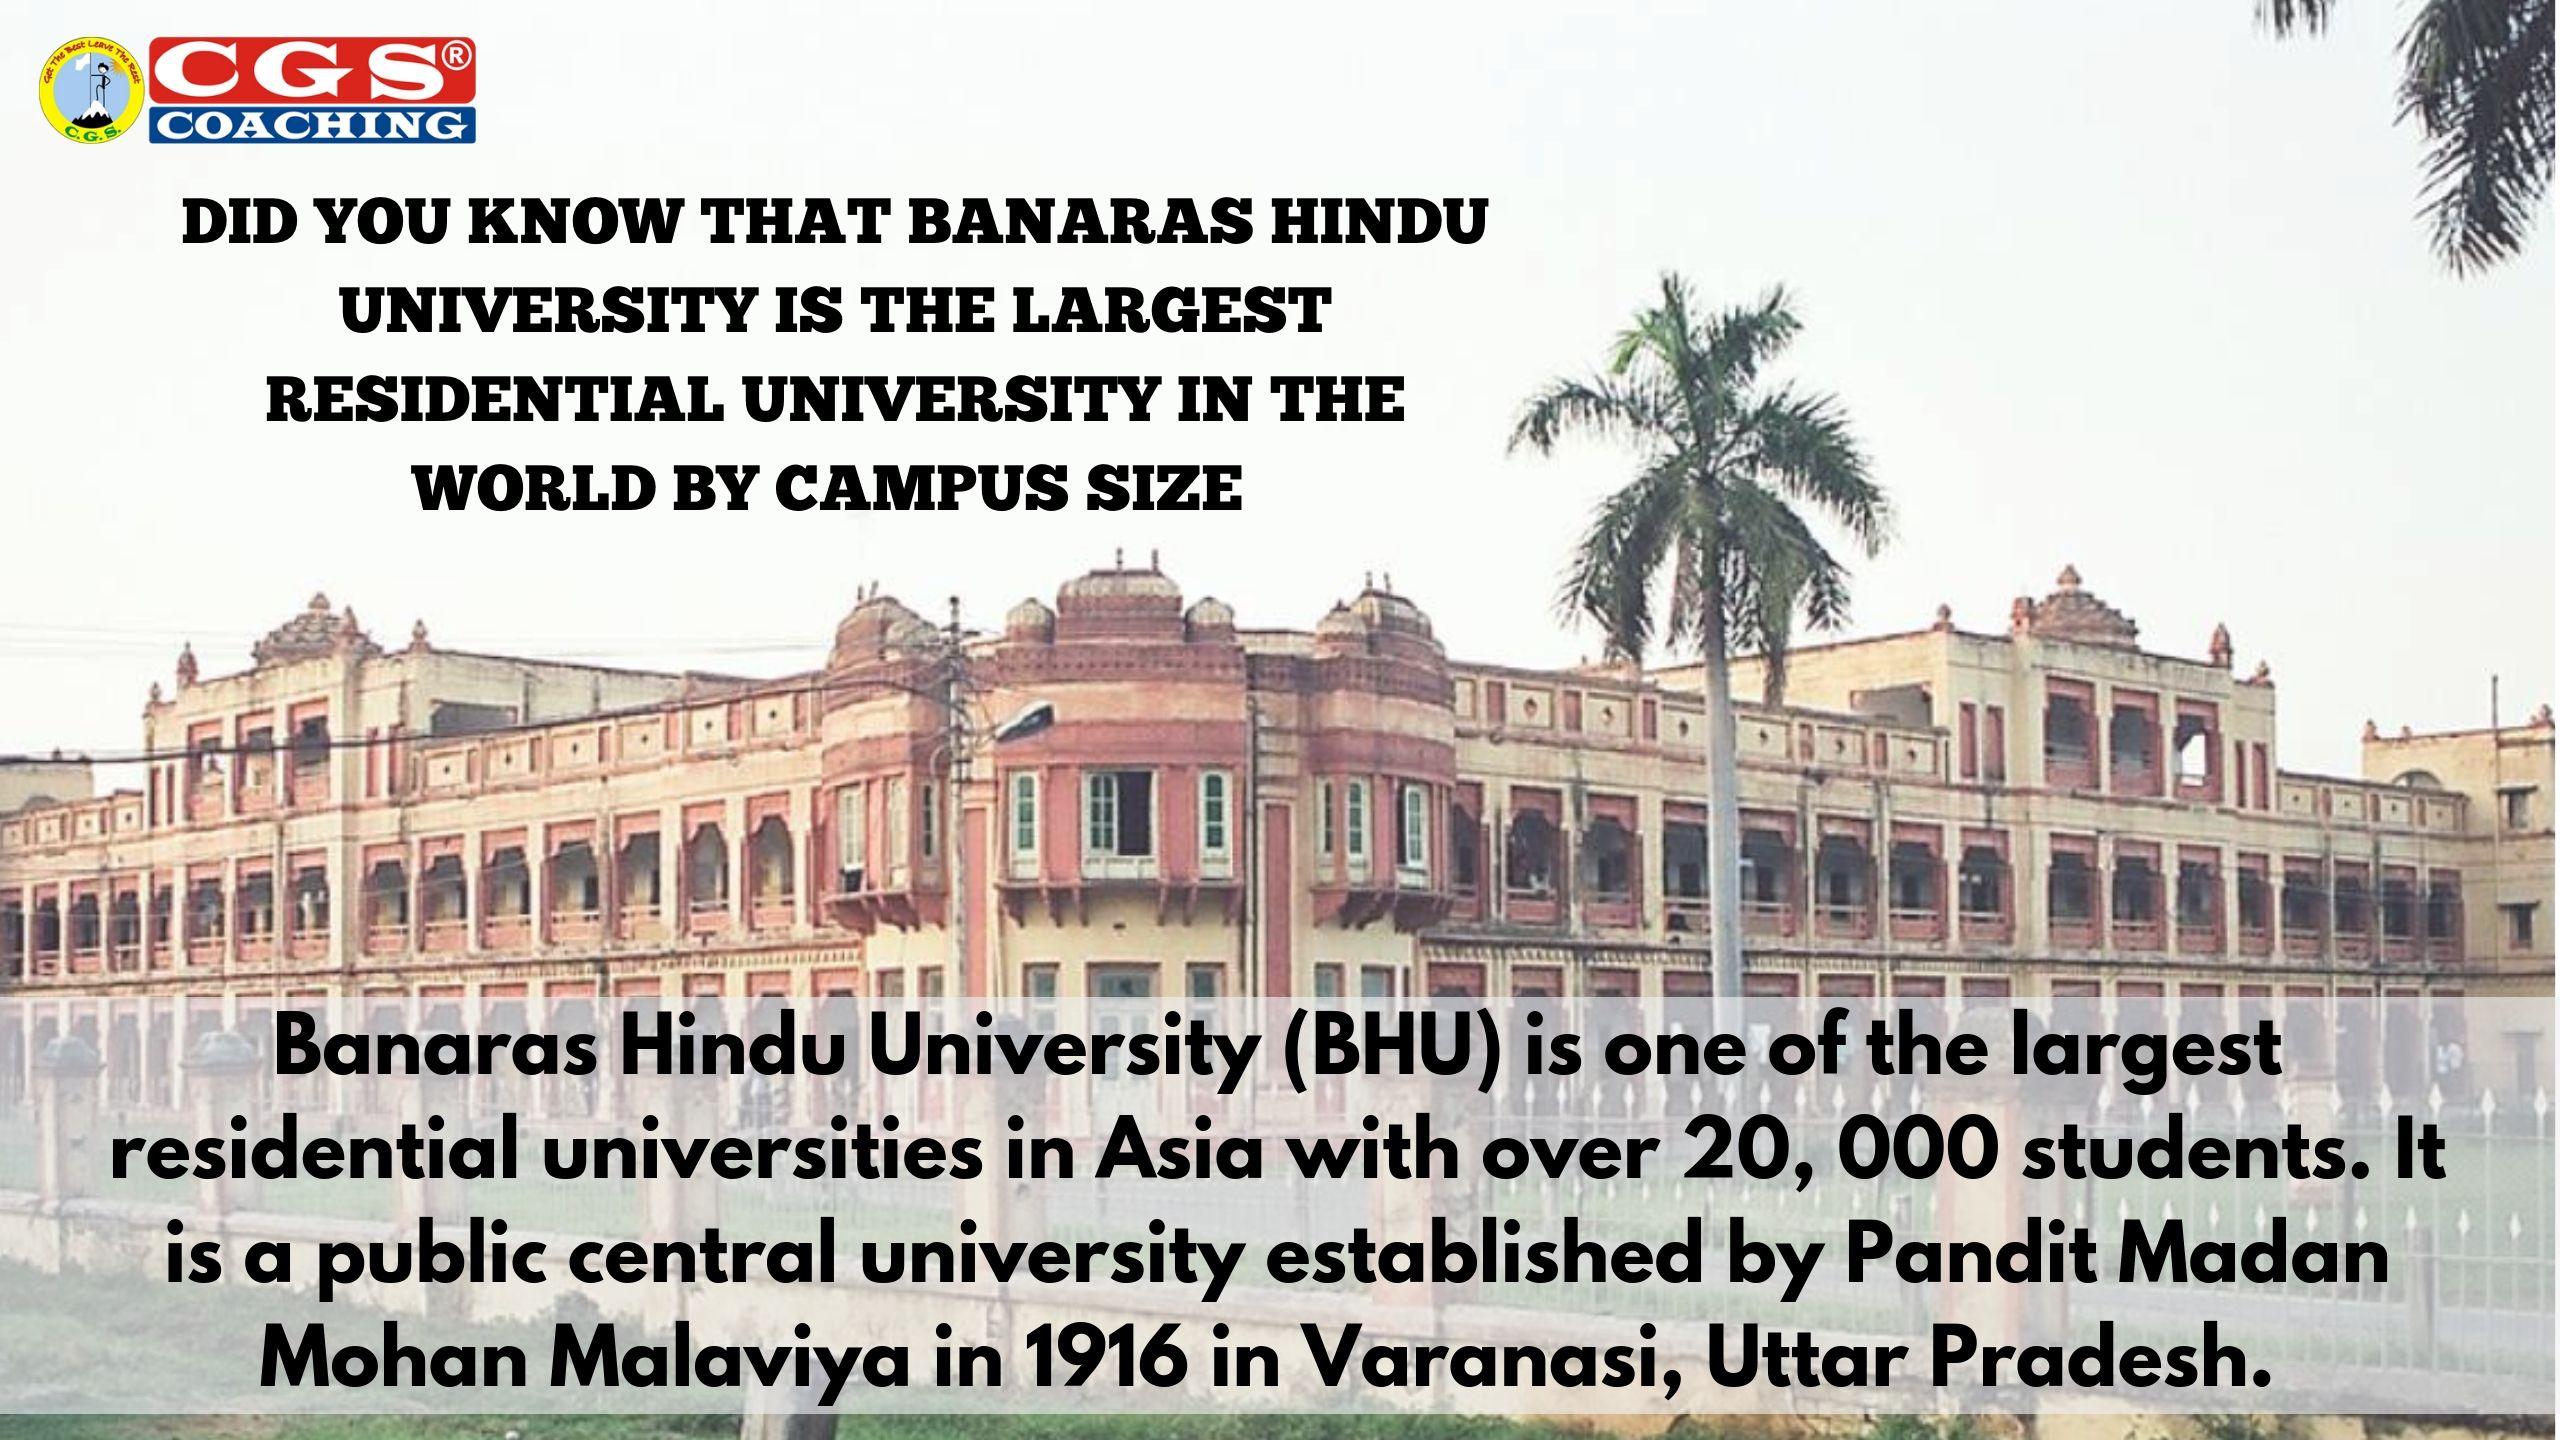 Largest University By Campus Size Central University Banaras Hindu University Government Services